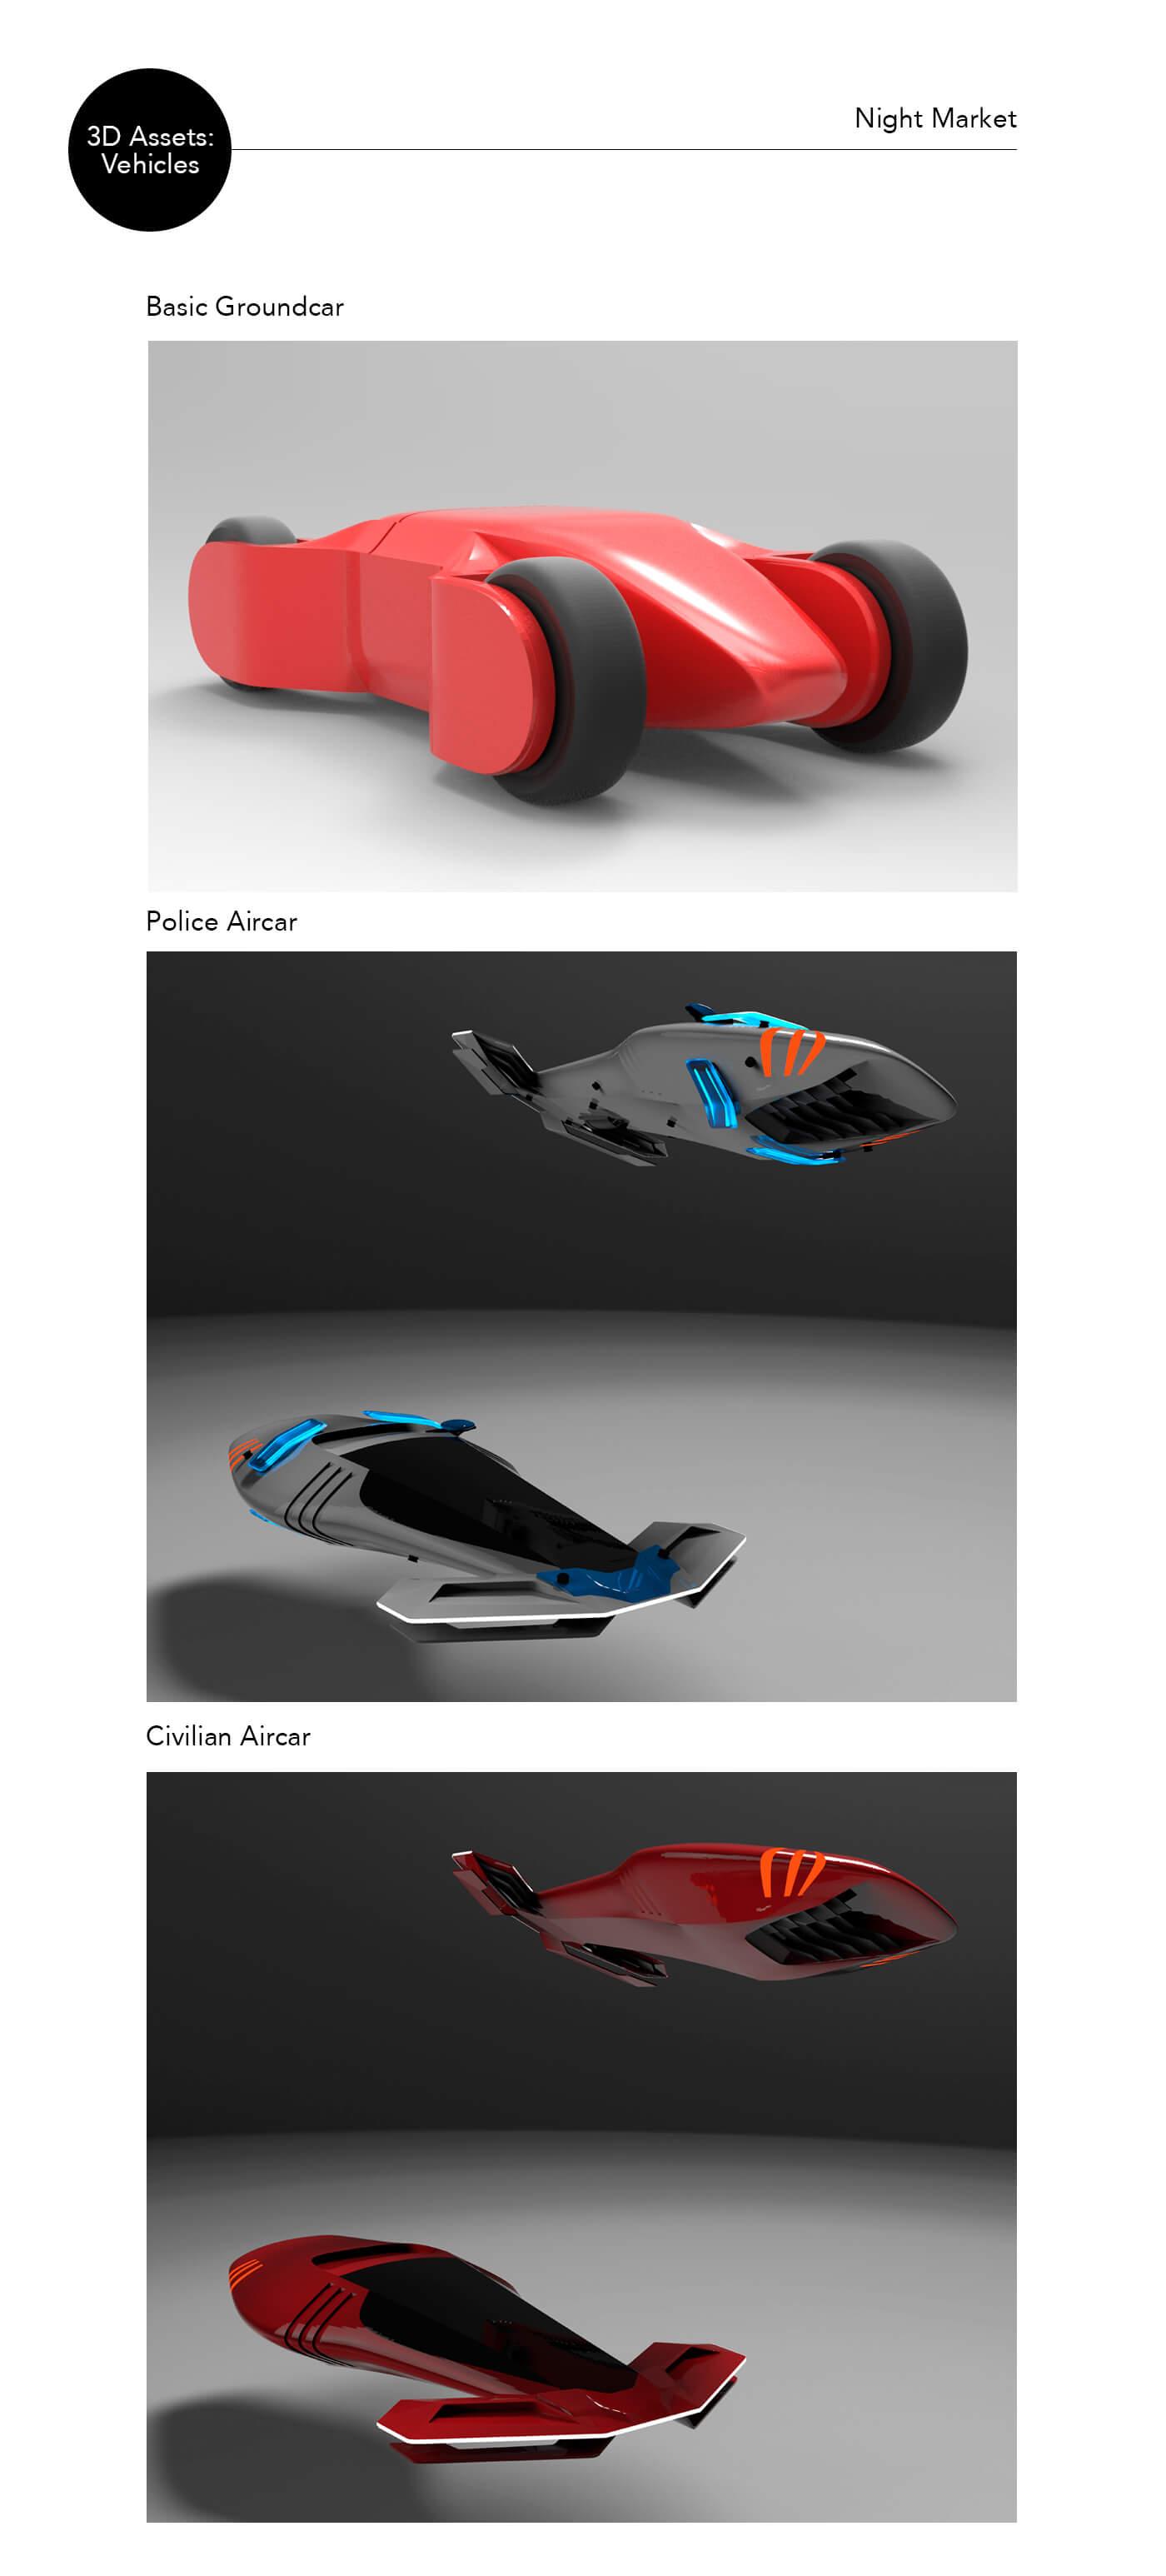 Night Market 3D vehicle assets